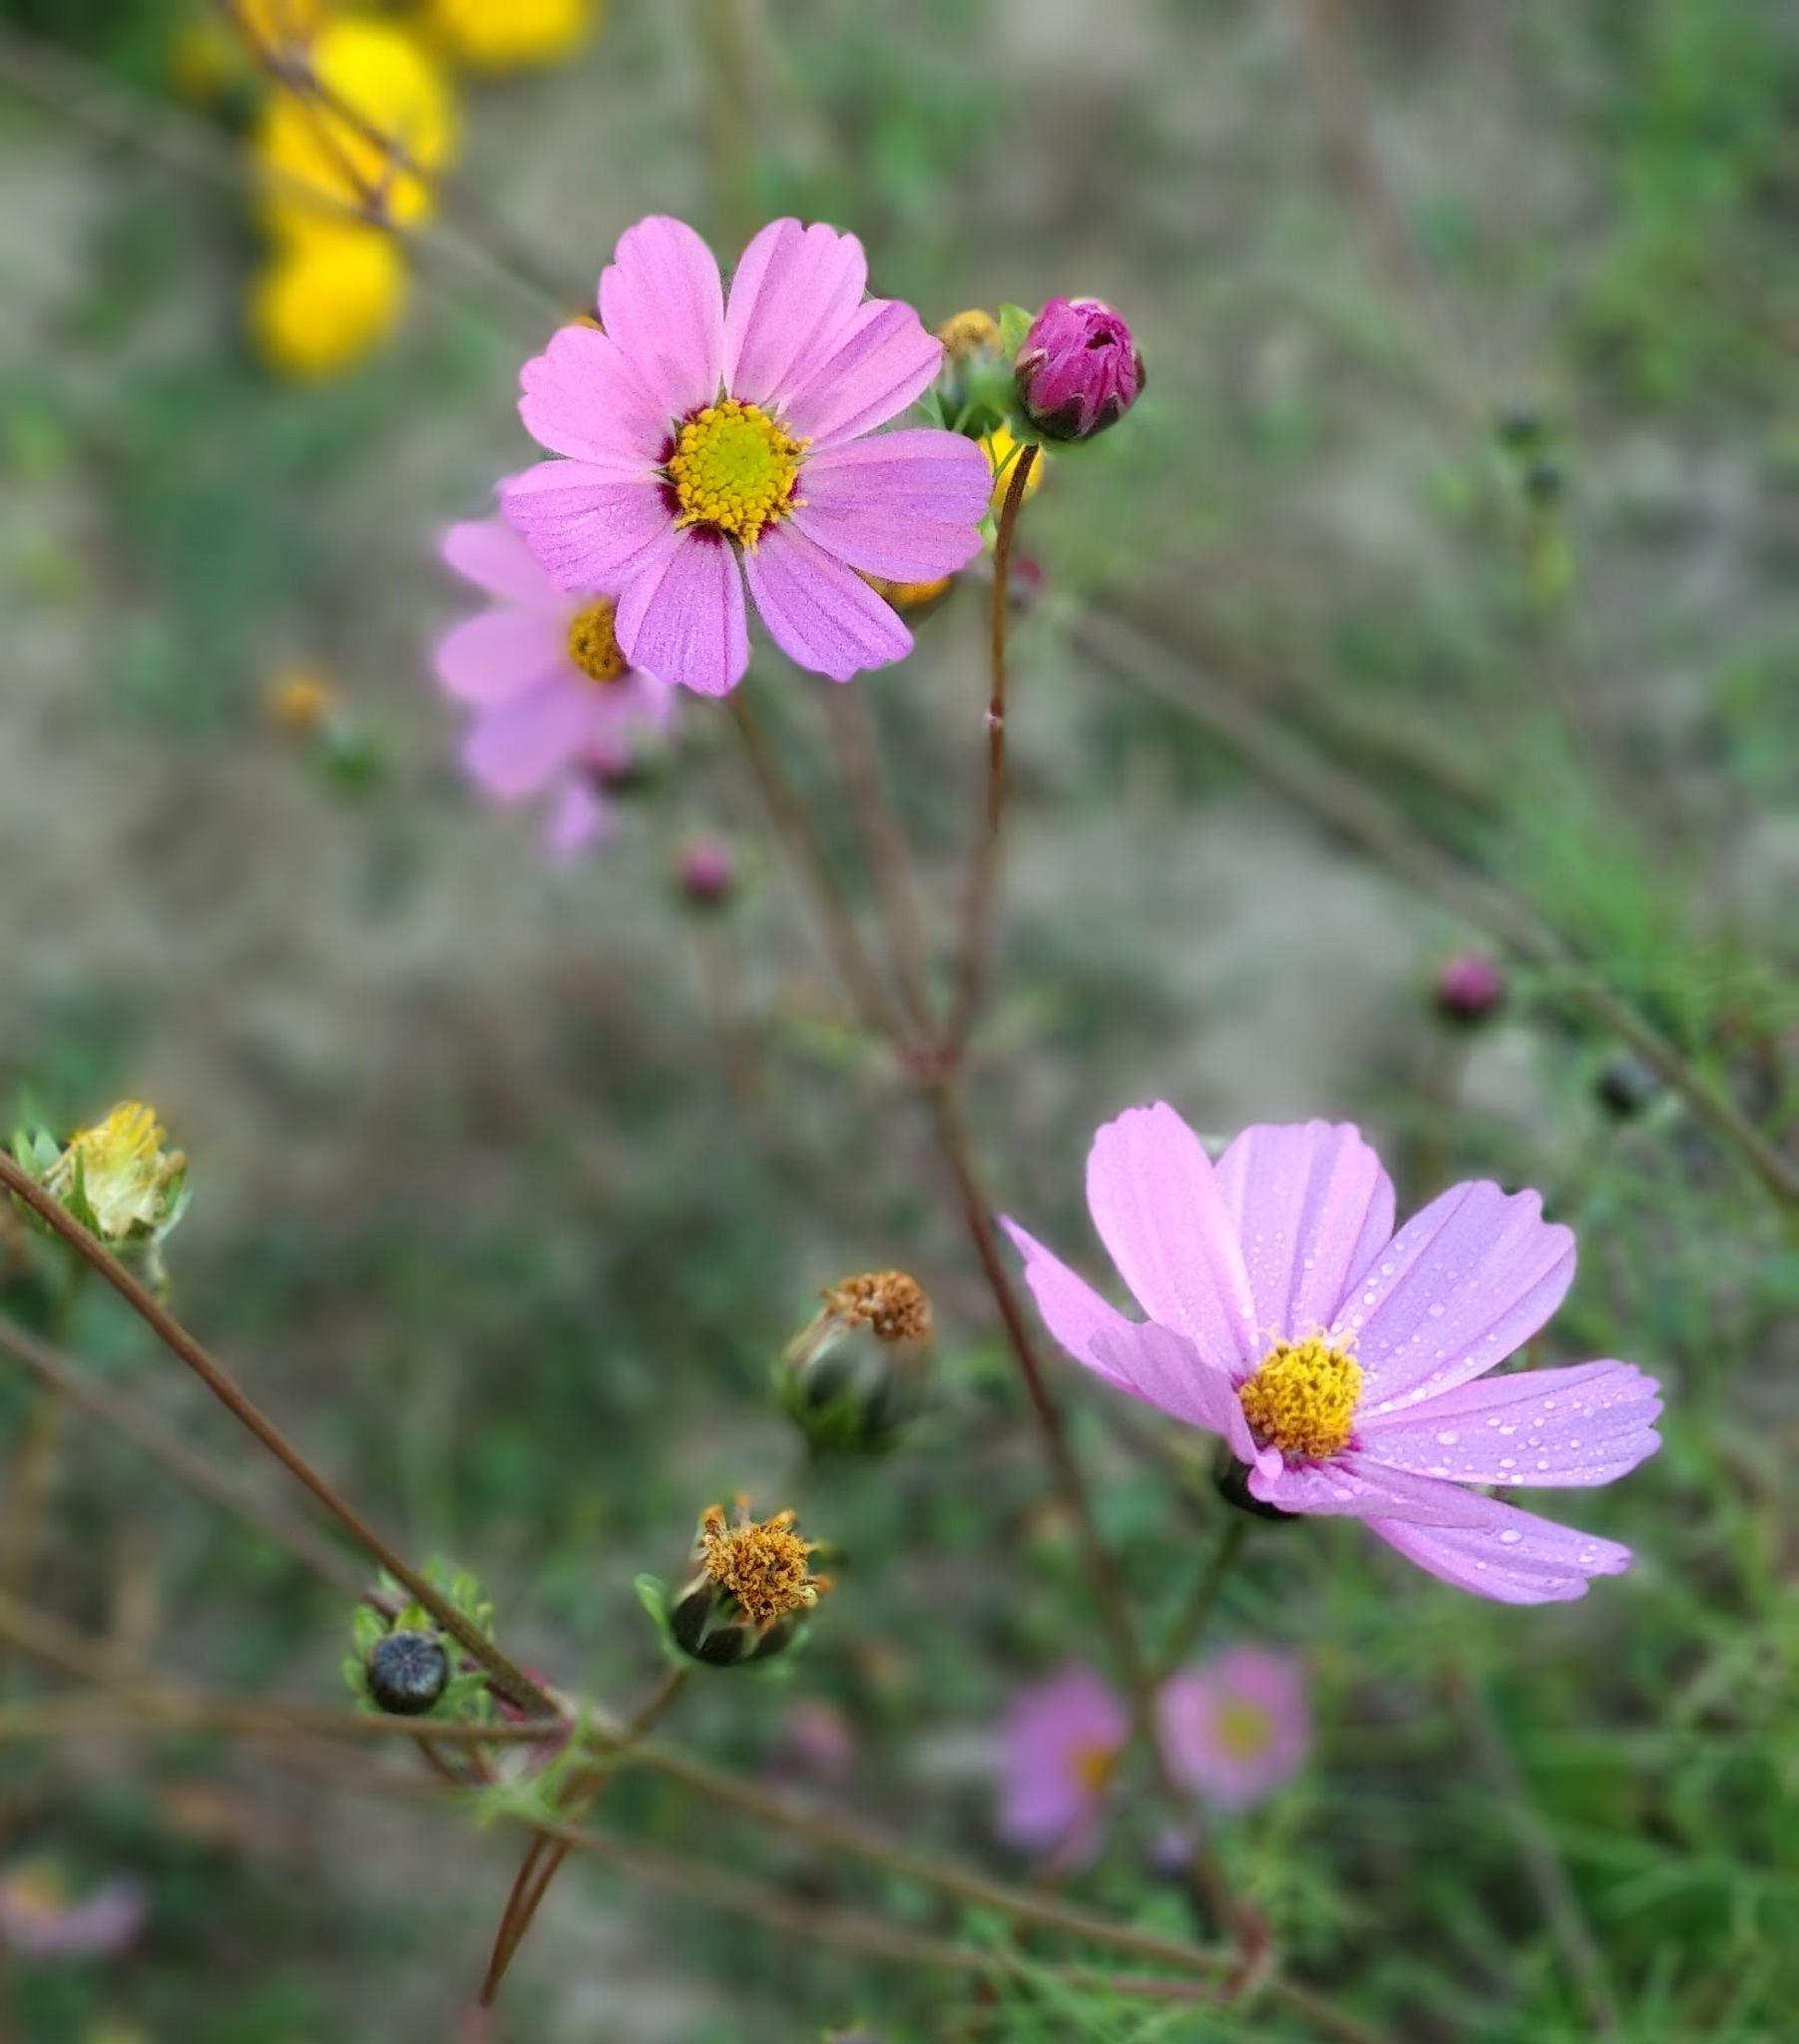 Flowers by Mahendra Chaurasia